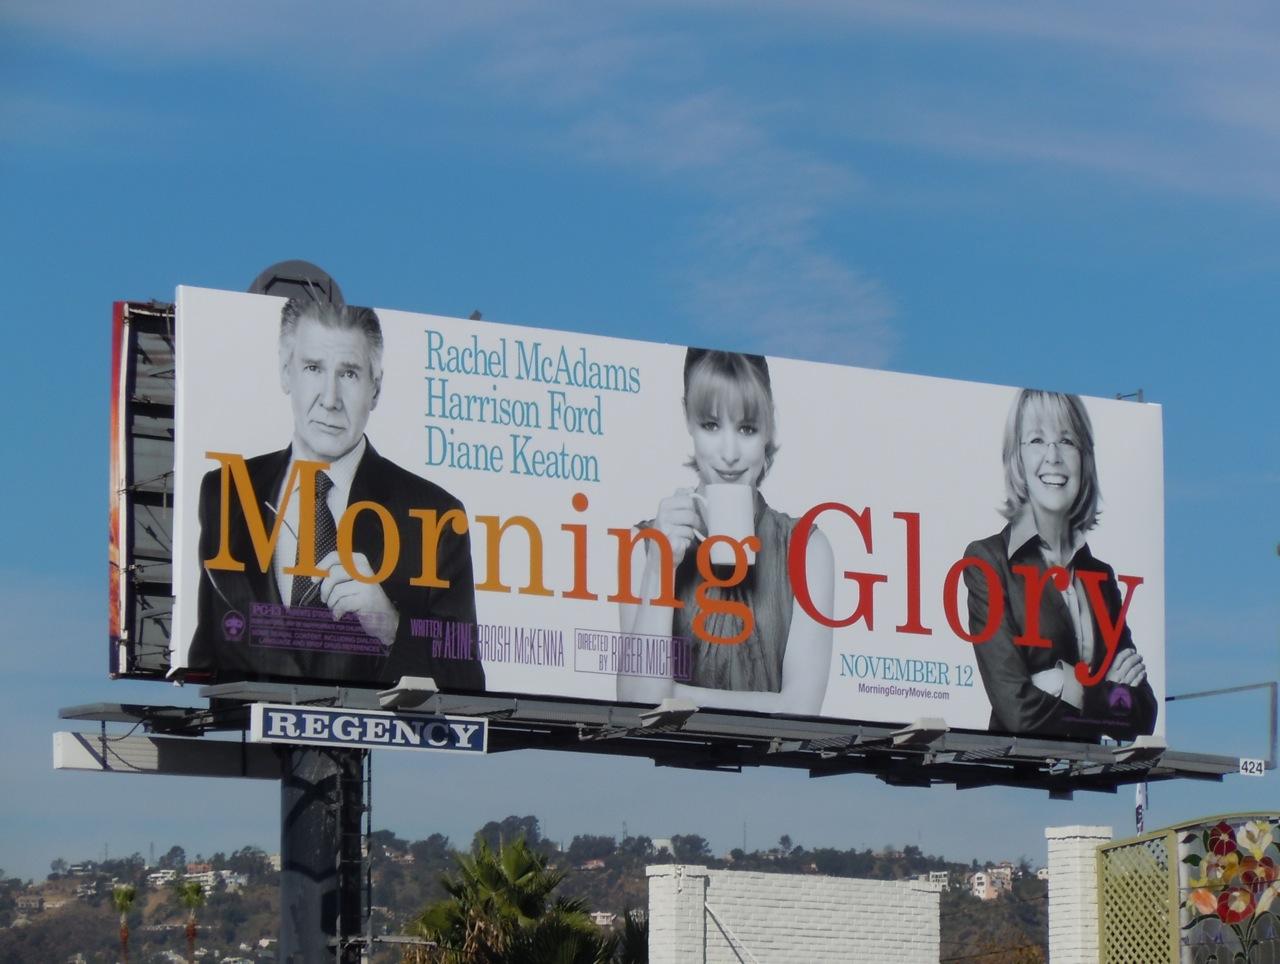 http://1.bp.blogspot.com/_GIchwvJ-aNk/TMi7EQSRKCI/AAAAAAAAV9Q/kEjQCgfw6So/s1600/Morning+Glory+movie+billboard.jpg